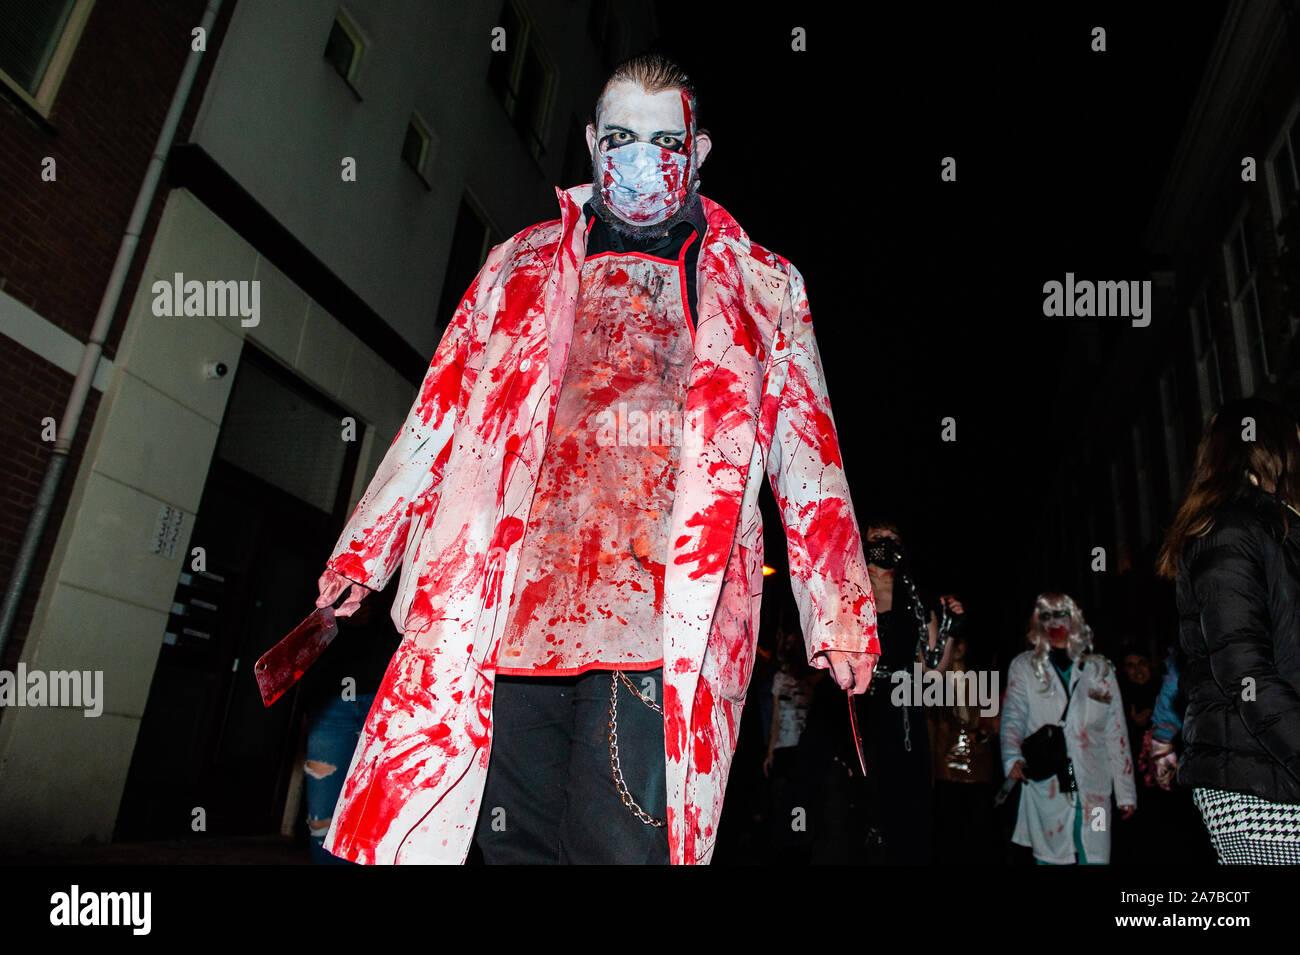 Halloween Arnhem.Arnhem Netherlands 31st Oct 2019 A Man Looking Like A Zombie Is Seen Walking On The